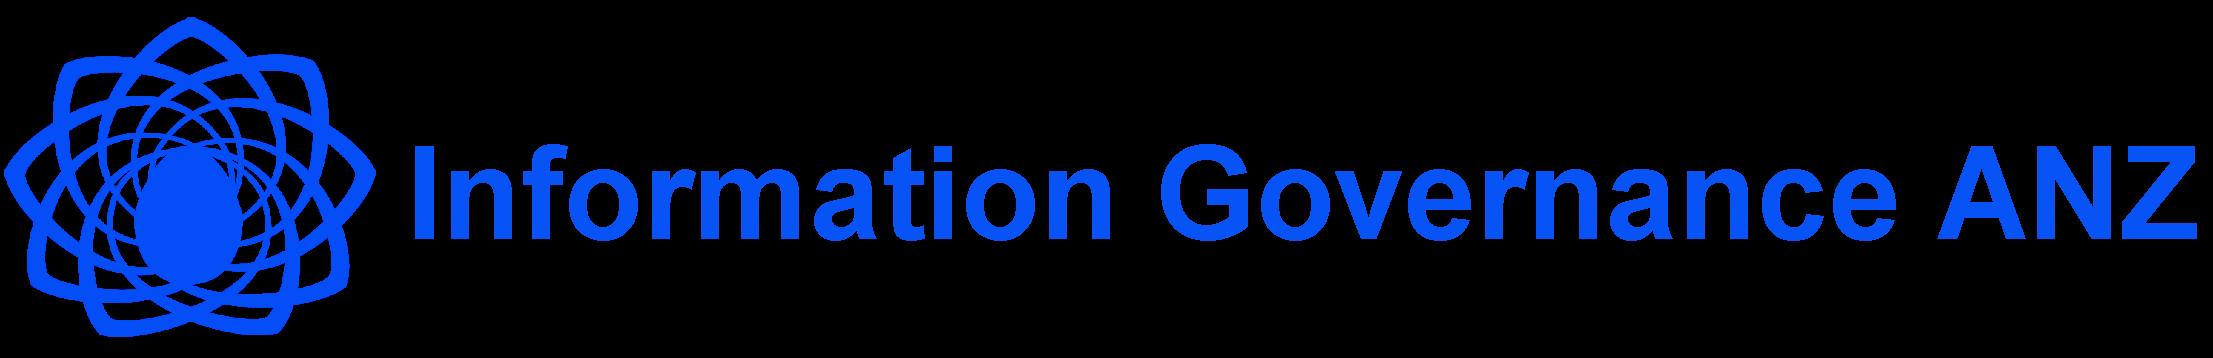 IG ANZ Full Logo (002)